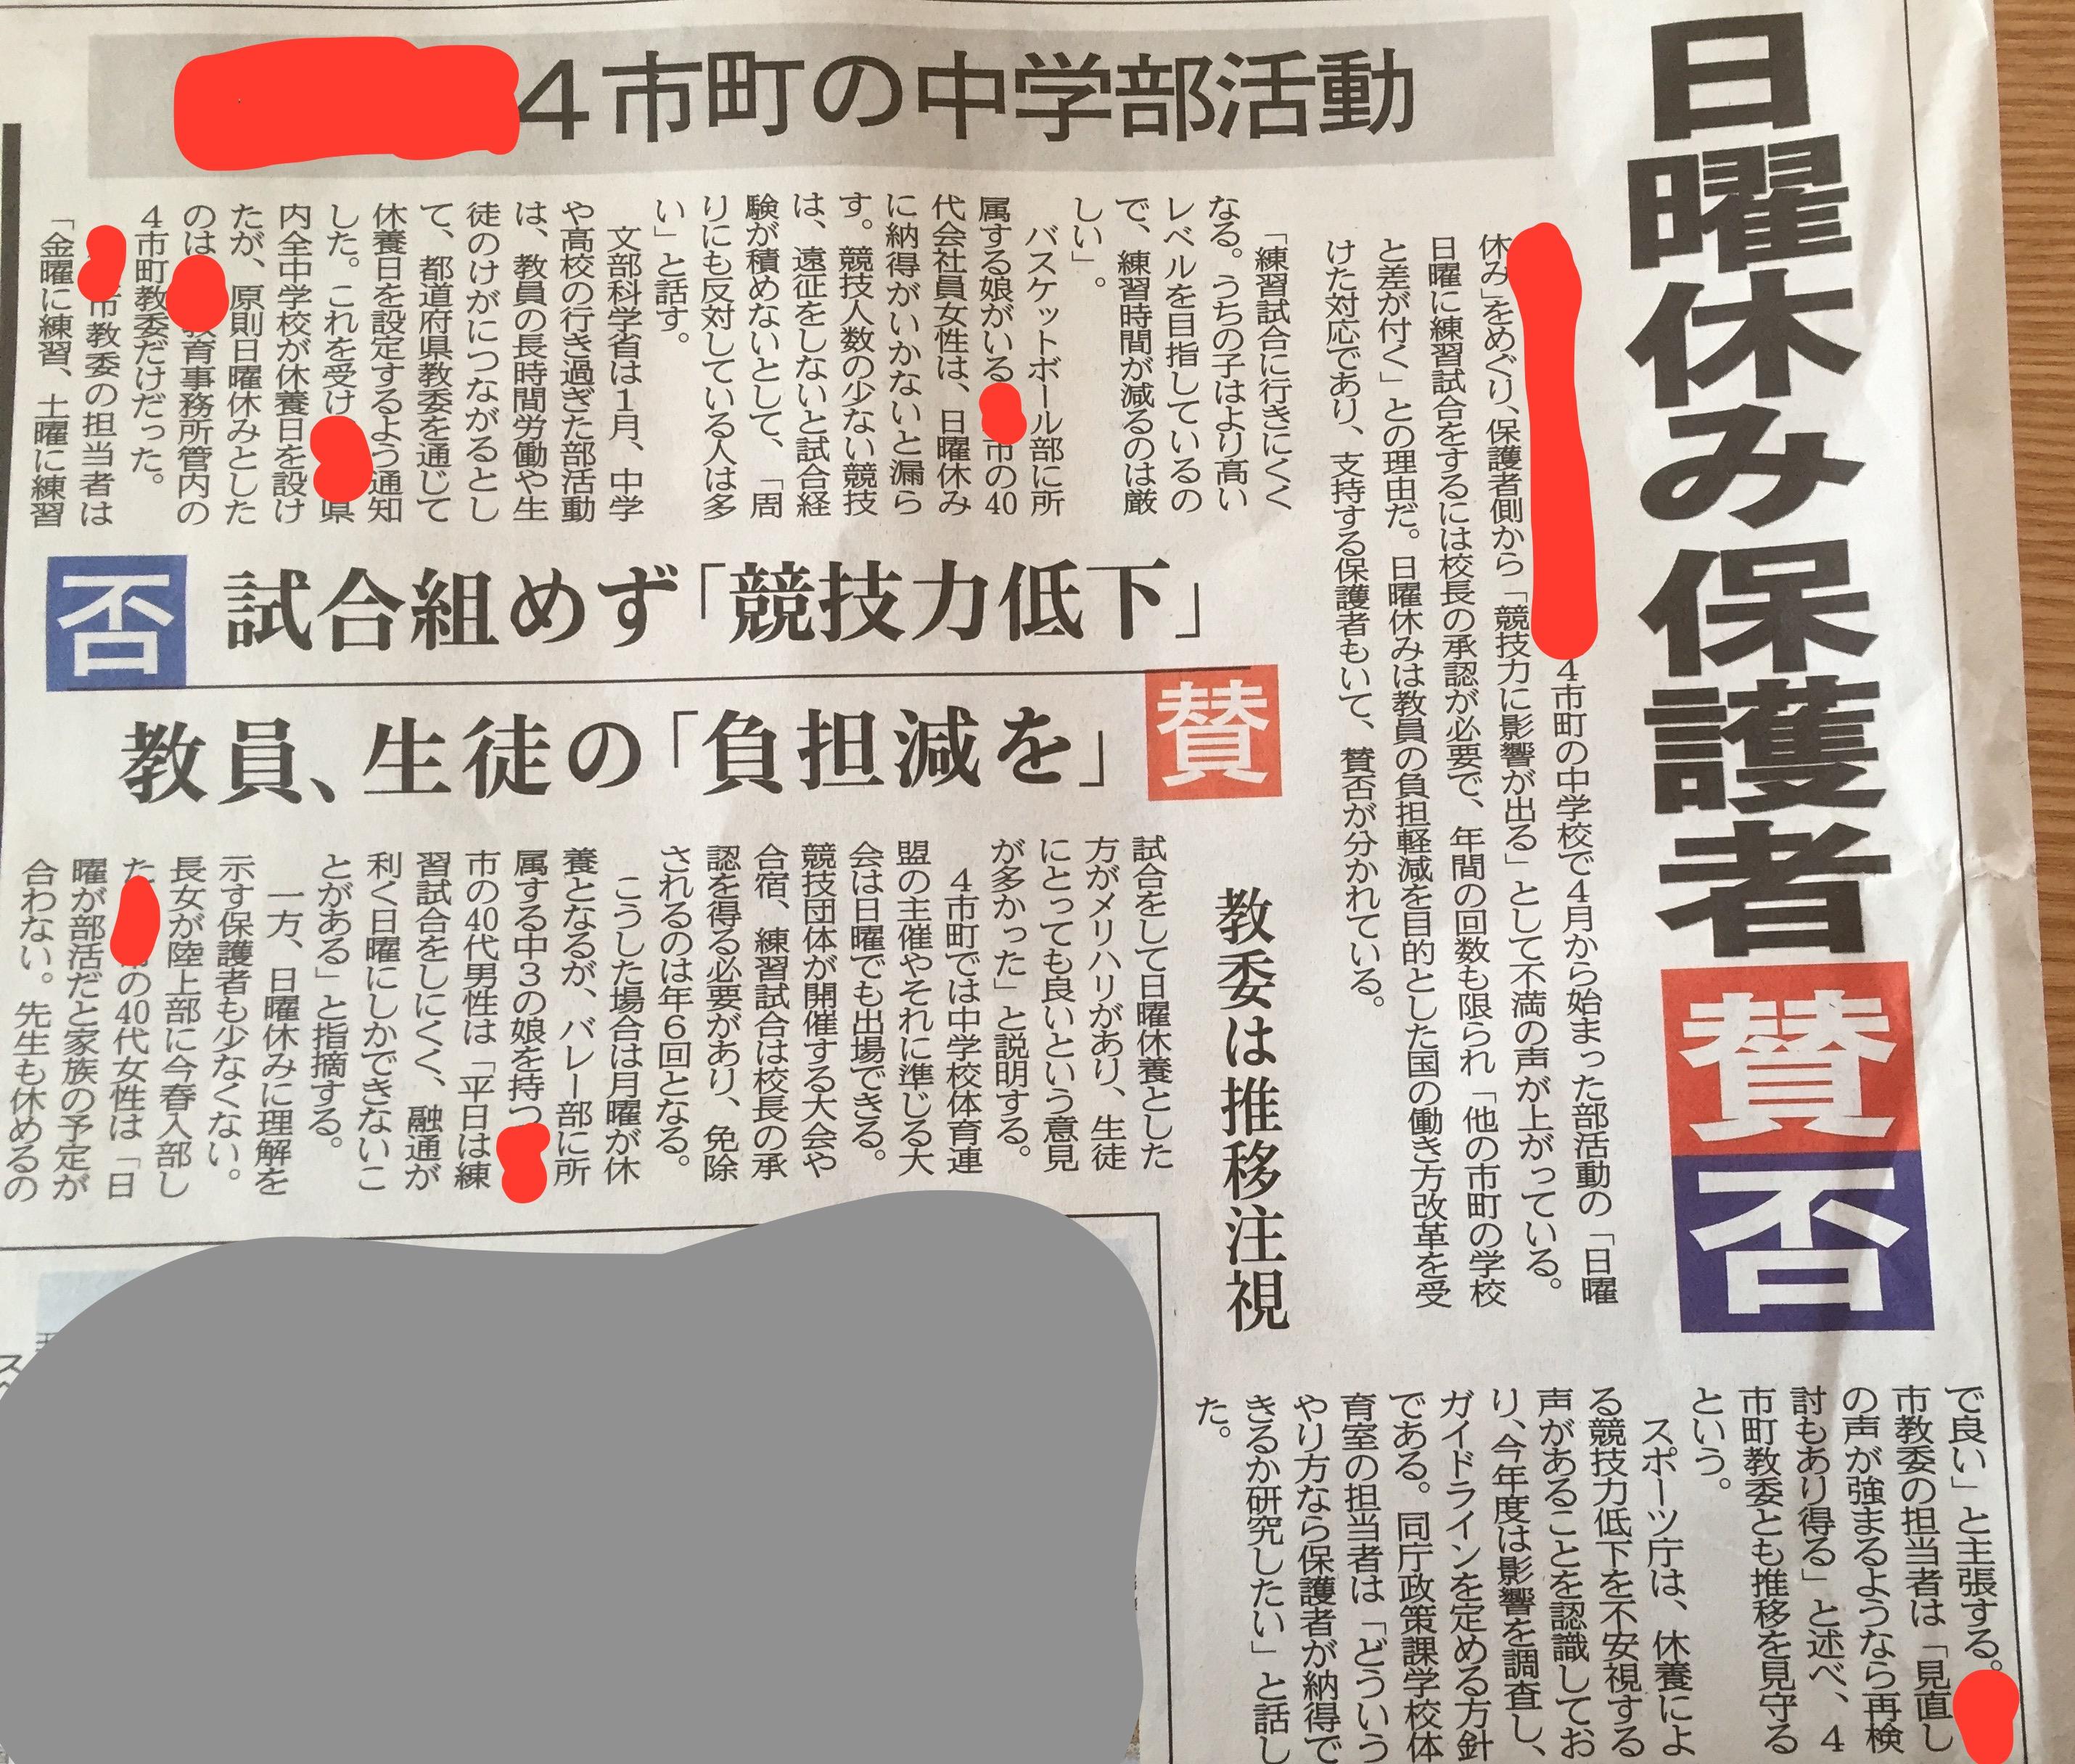 http://www.miho1ara.com/wp-content/uploads/2017/04/IMG_4683.jpg